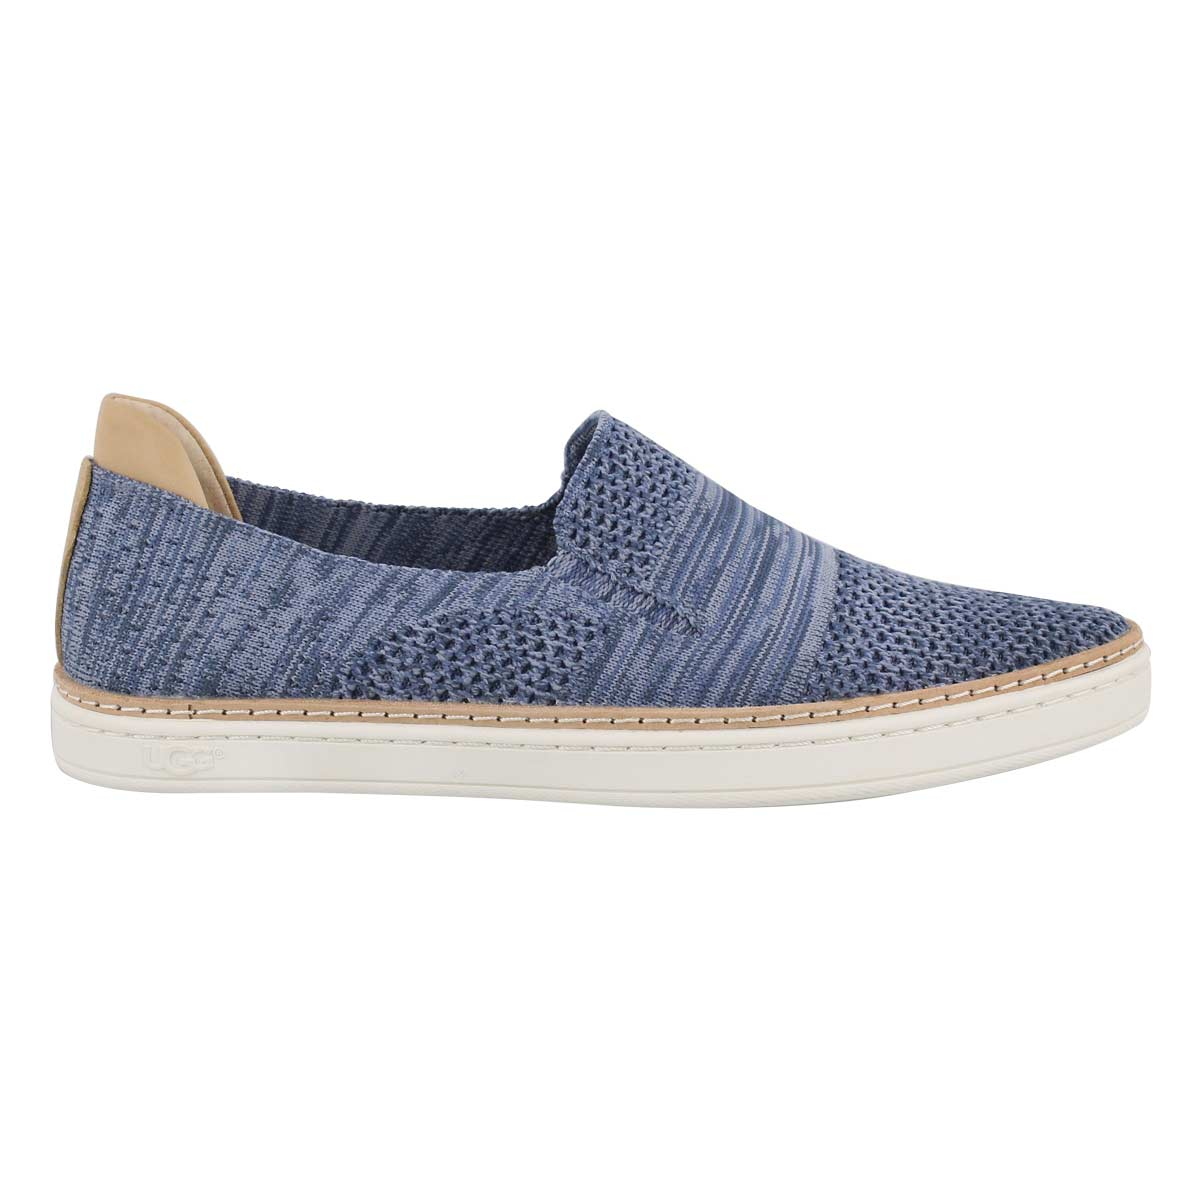 Lds Sammy nvy hthr casual slip on shoe